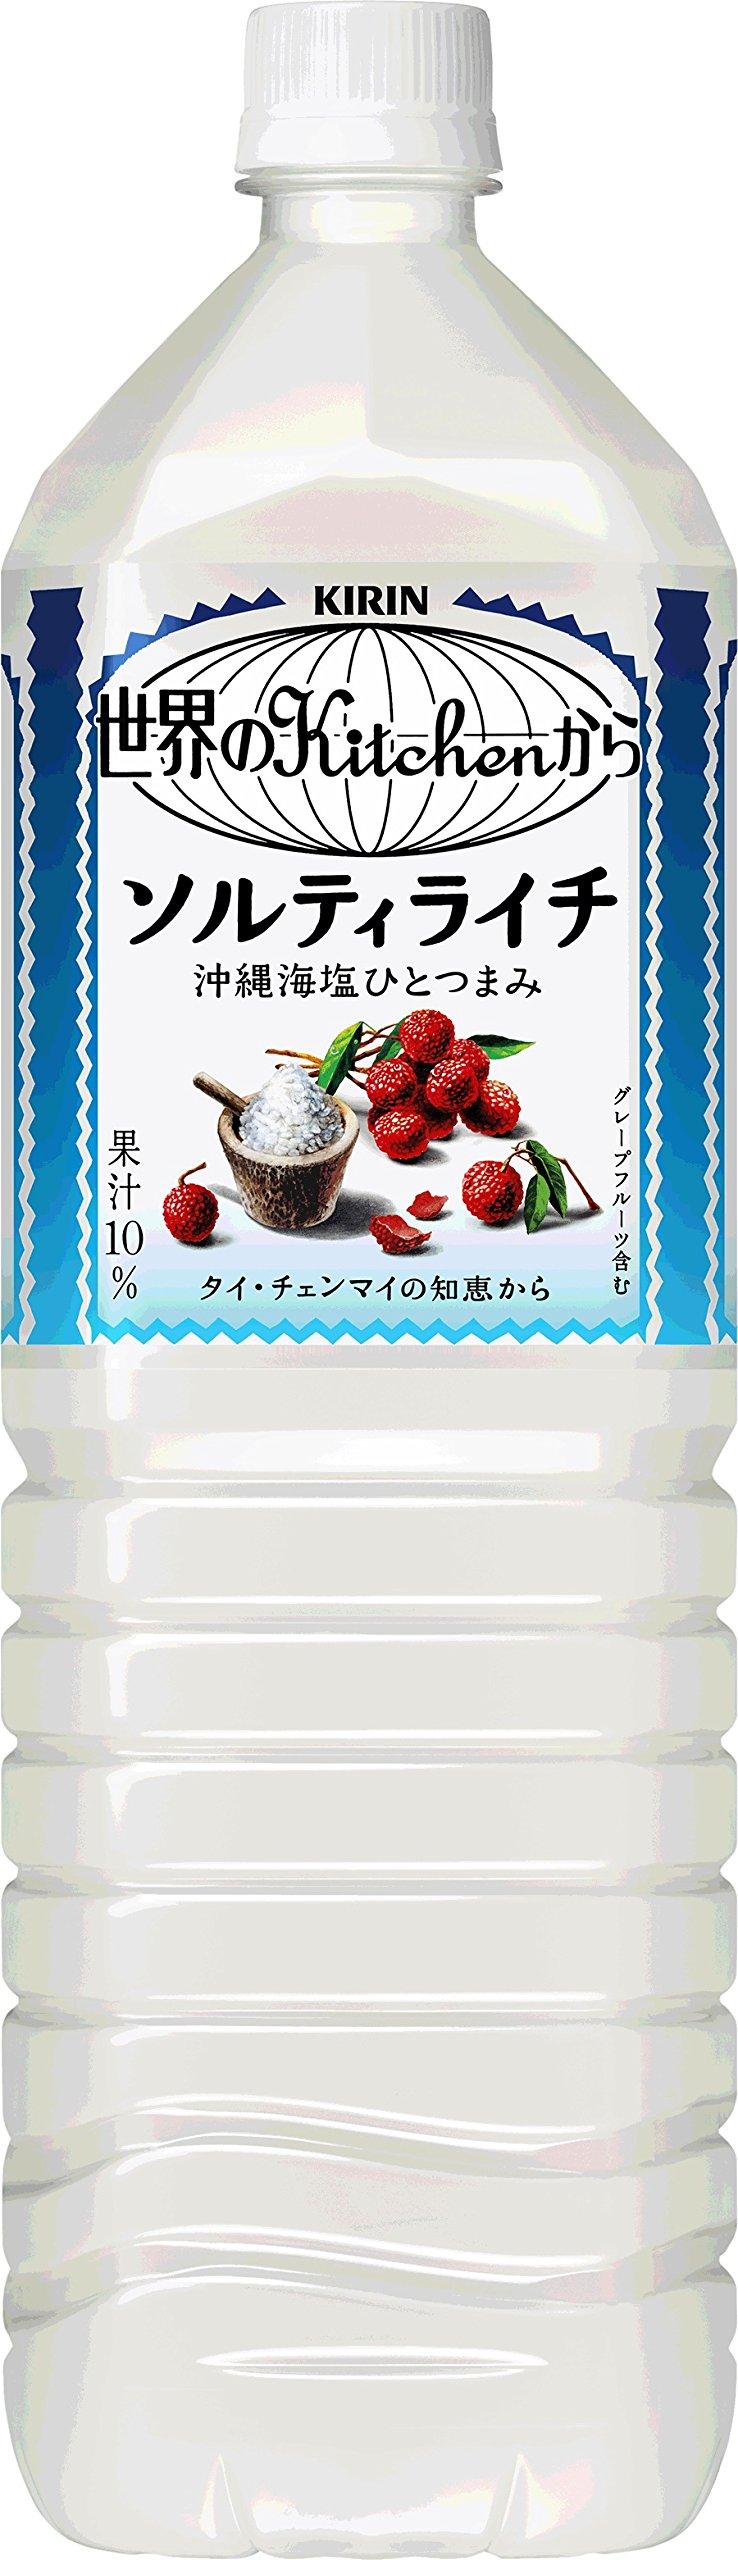 Salty lychee 1.5L ~ 8 this from giraffe World Kitchen